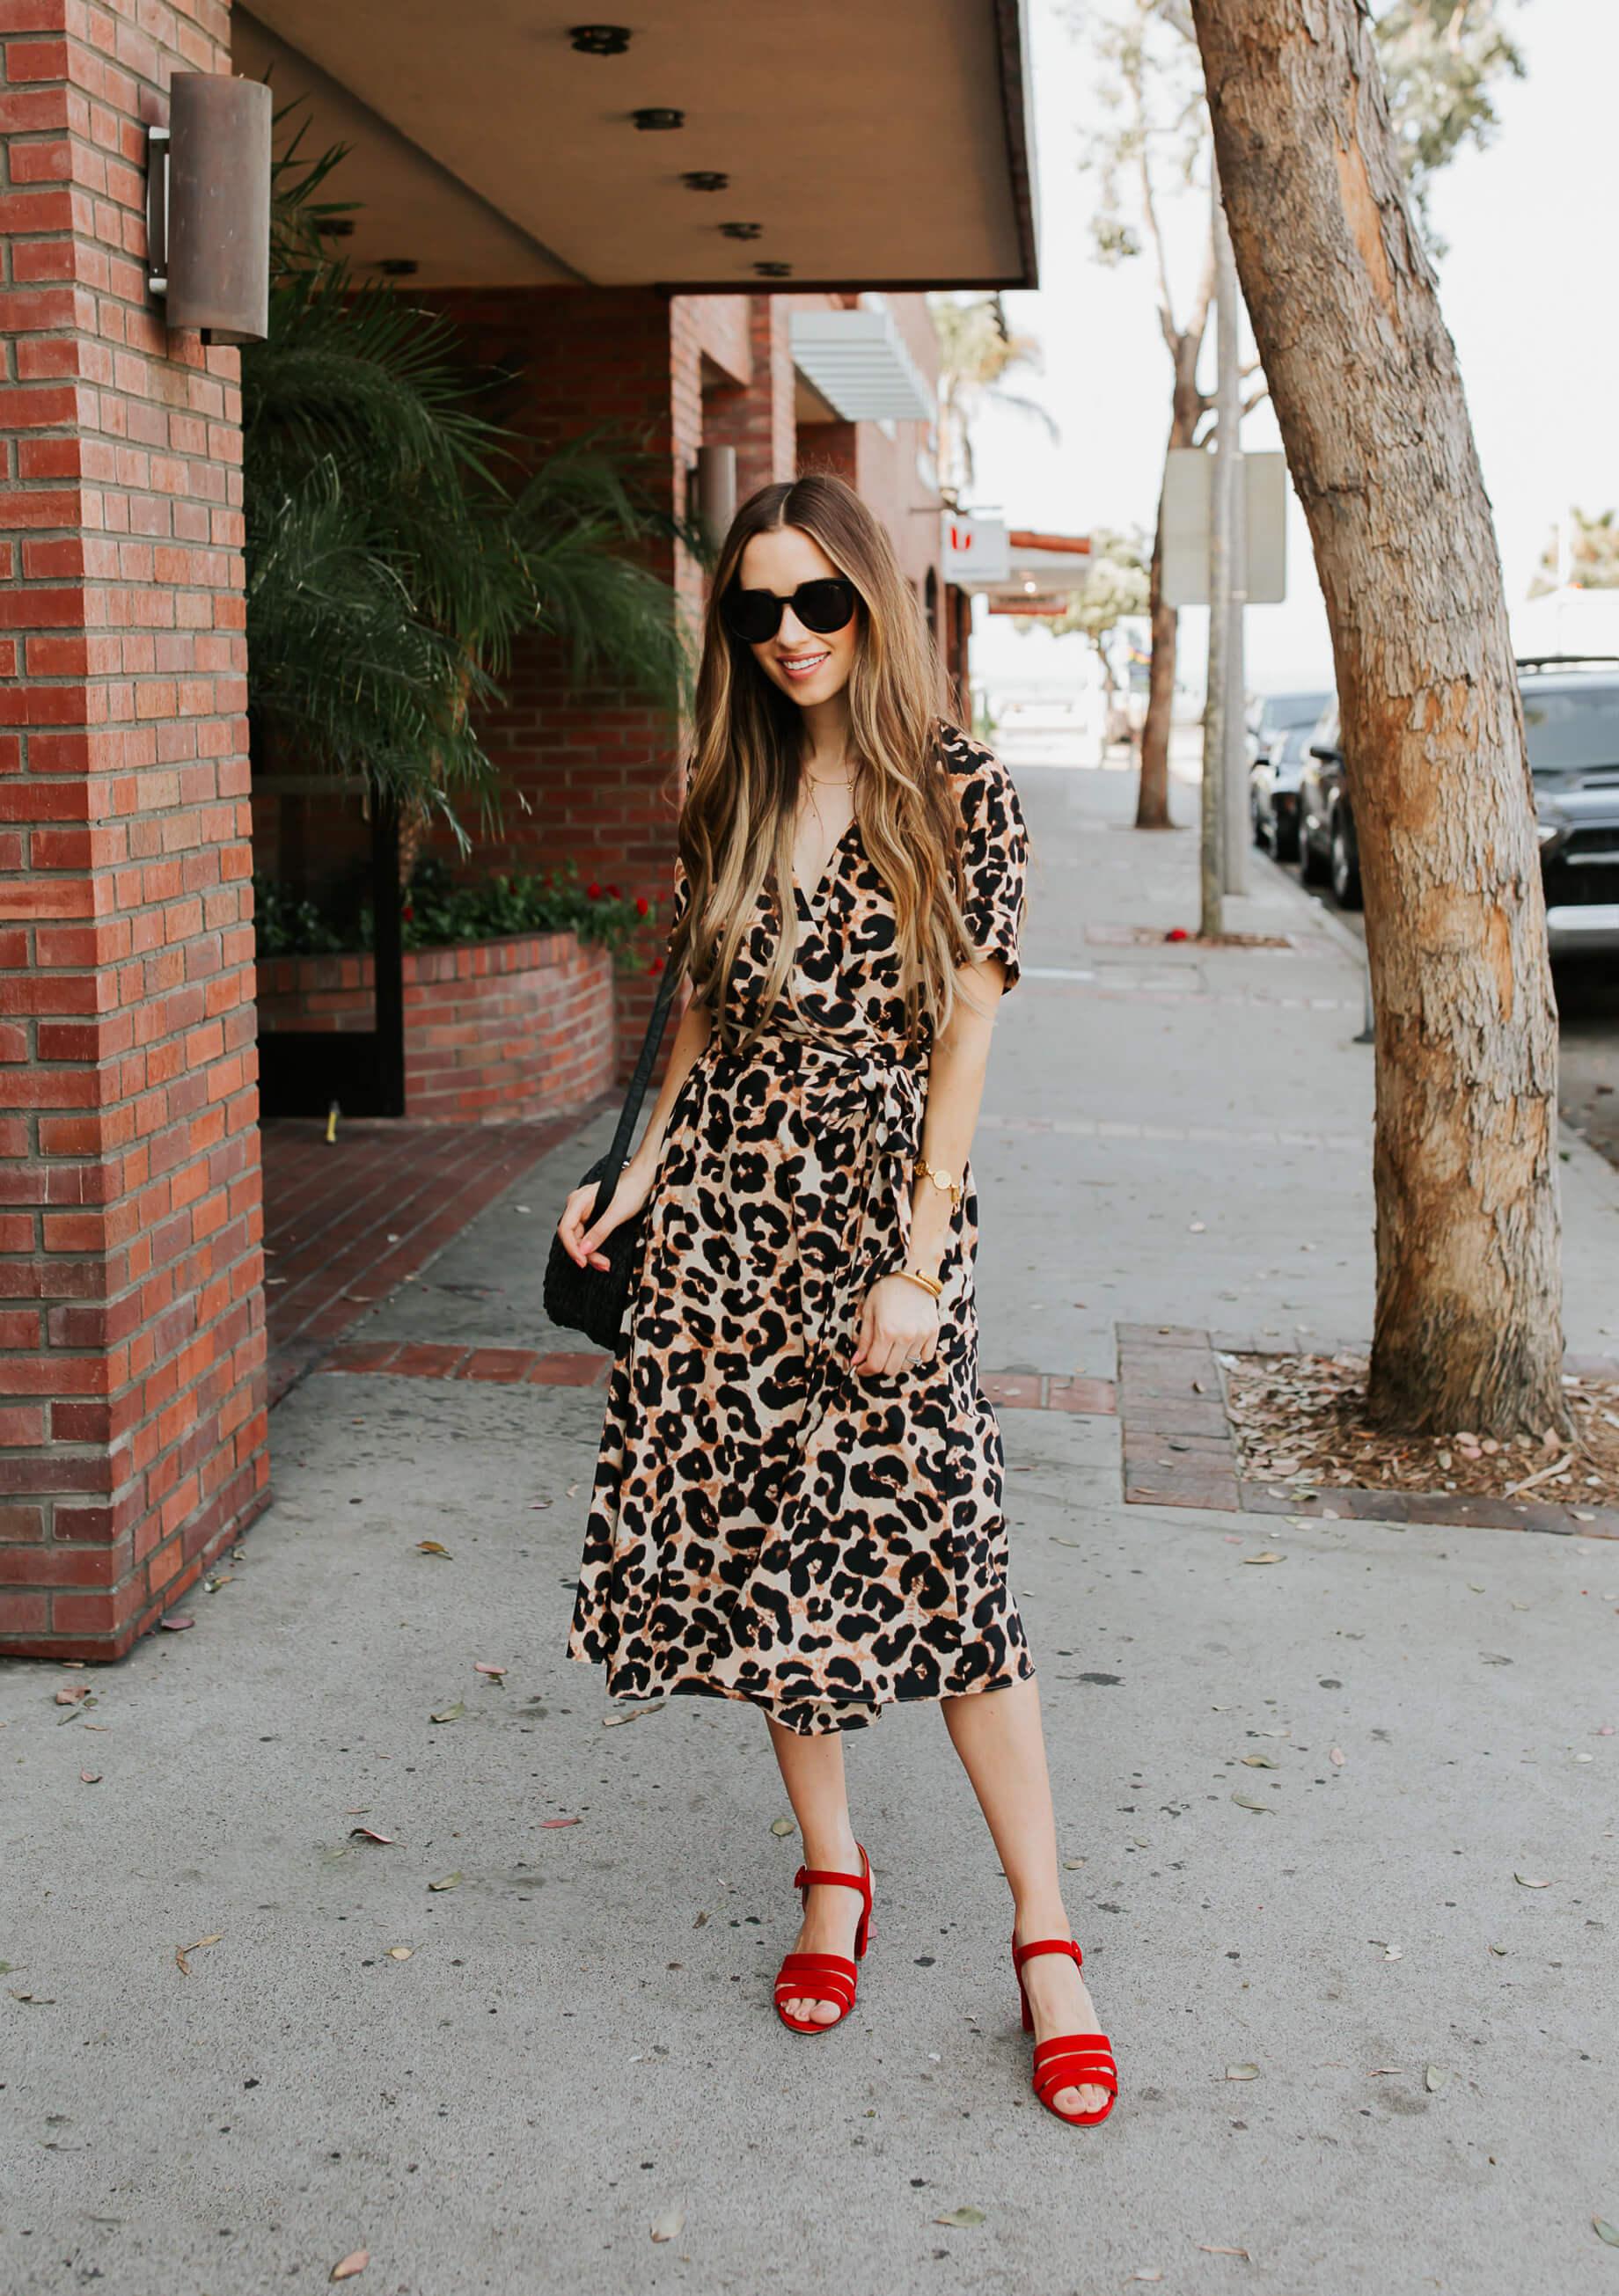 A Classic Way to Wear Leopard Print